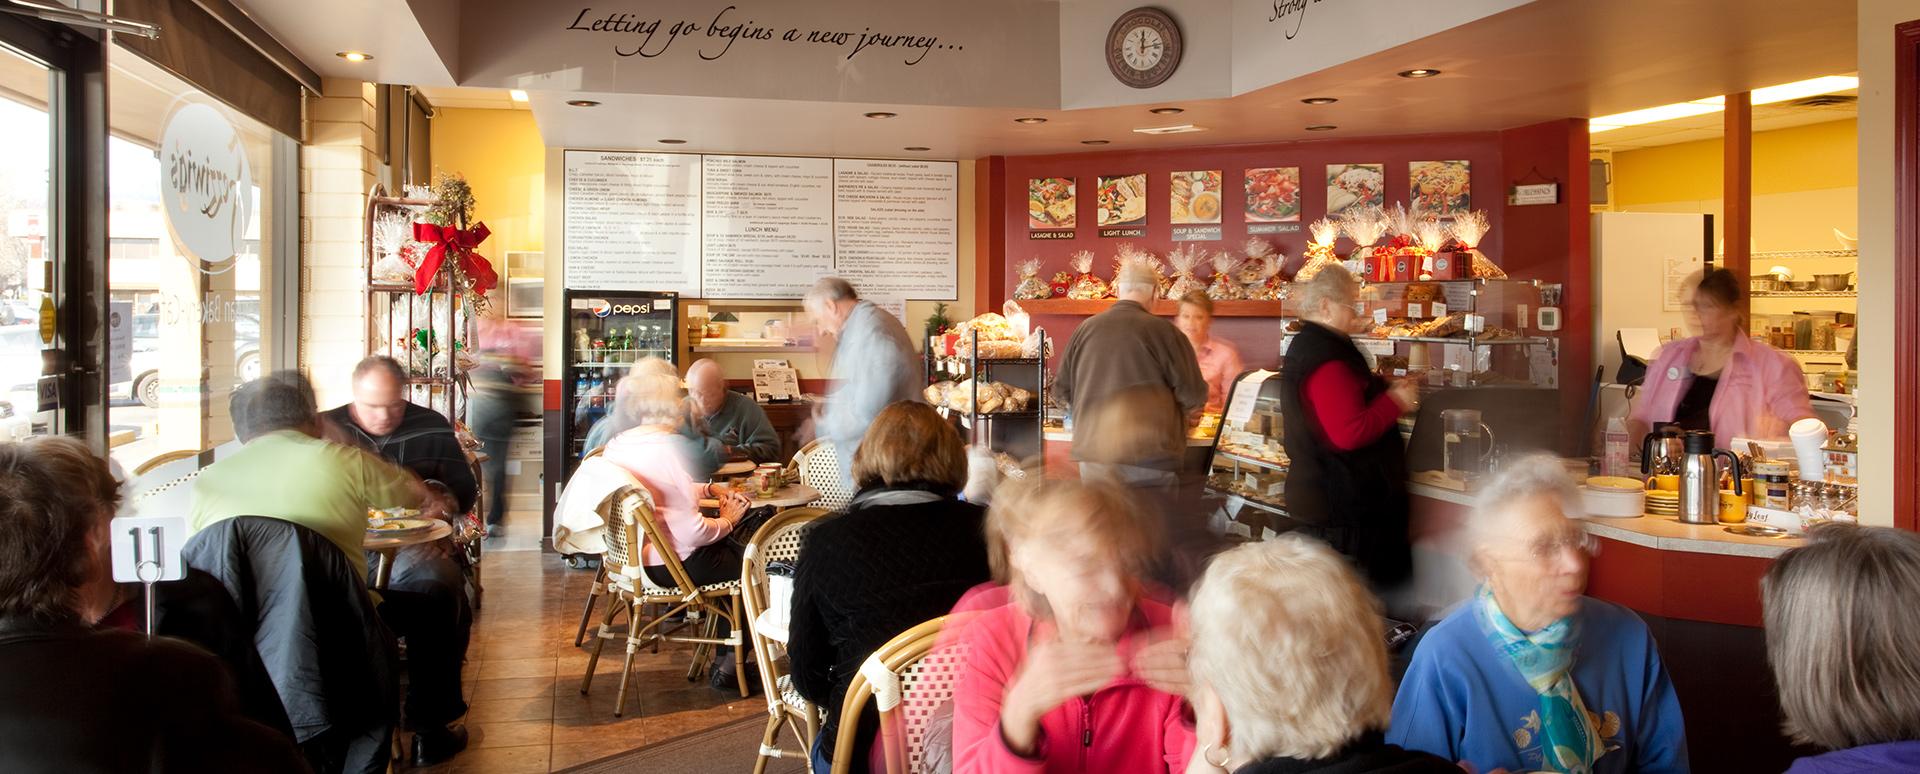 Fezziwig's Cafe-Bakery Kelowna Interior